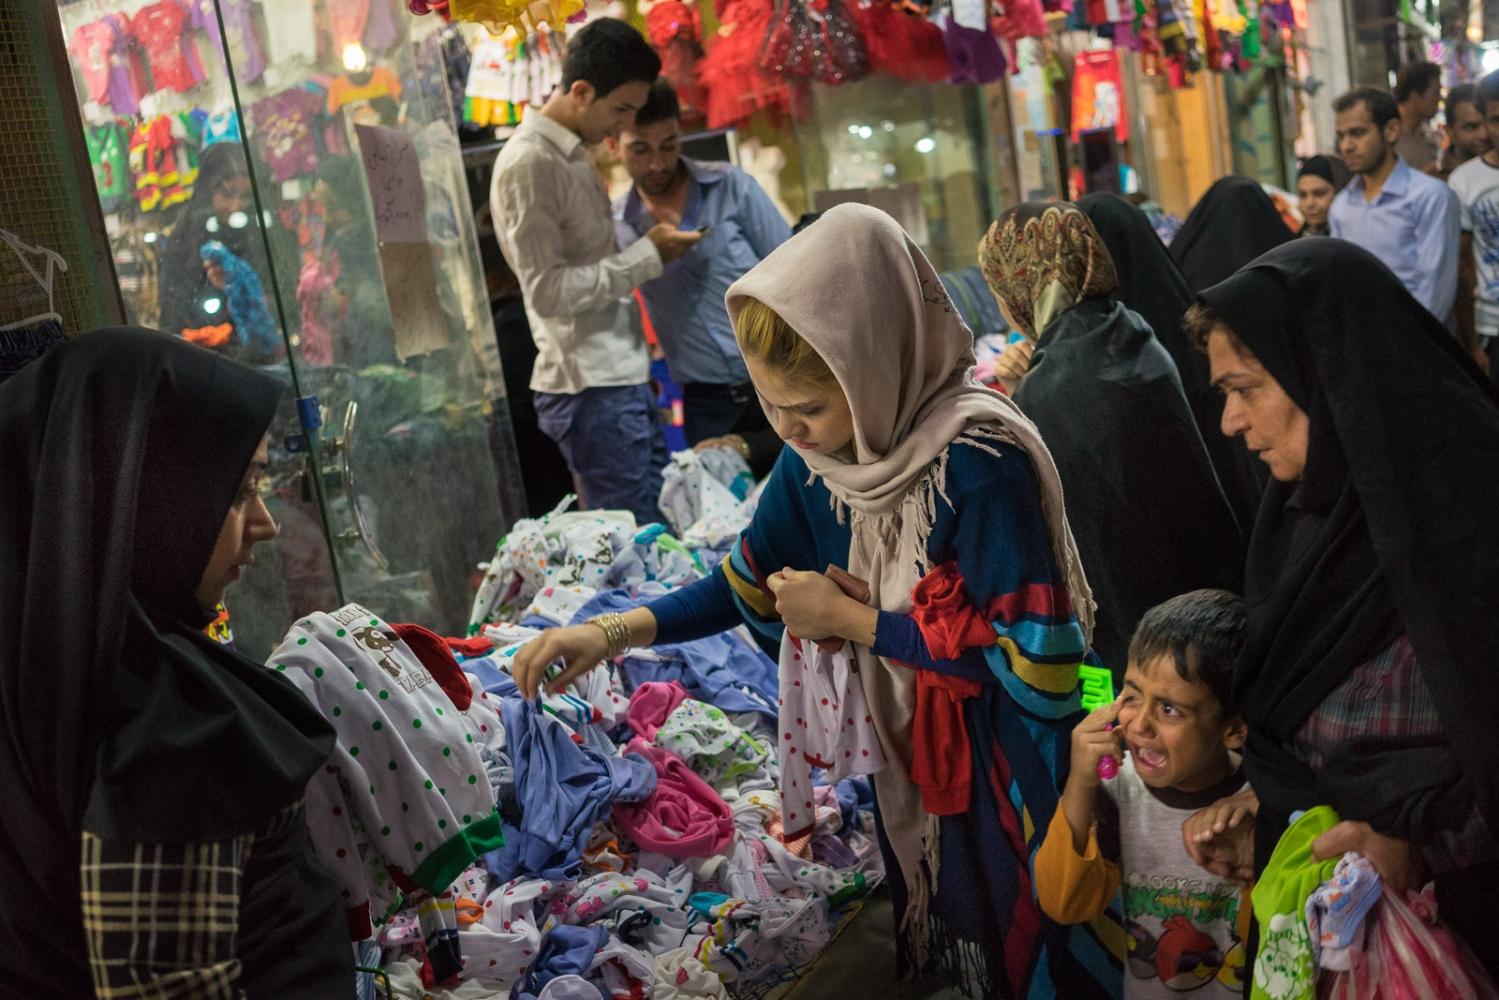 Art and Documentary Photography - Loading 011-iran_consumerism.jpg